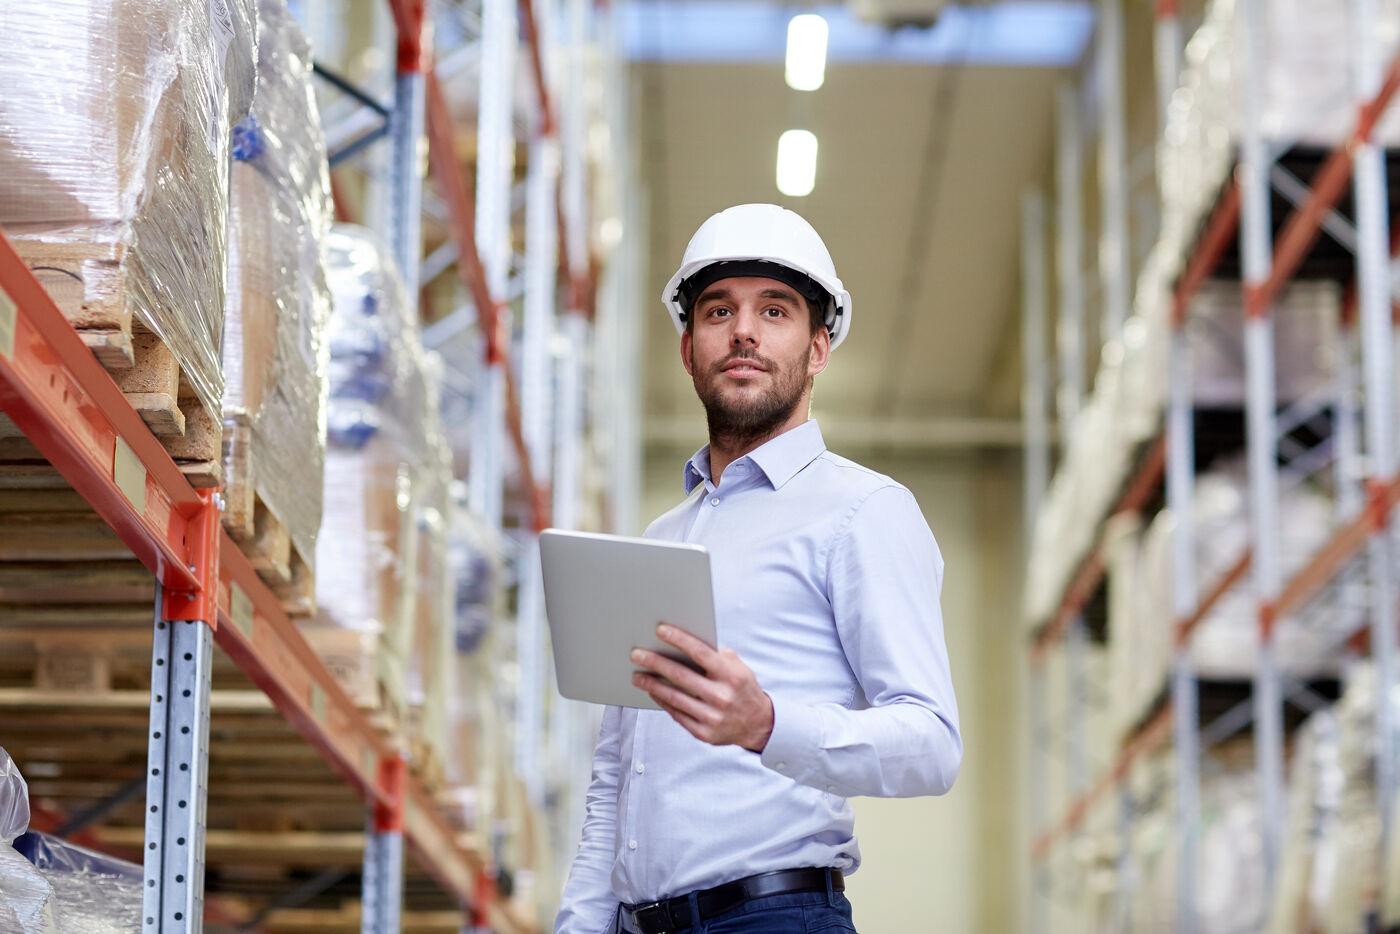 Kommissionierer / Lagermitarbeiter (m/w/d) - Job Stolberg - Jobs bei Discovergy - Application form